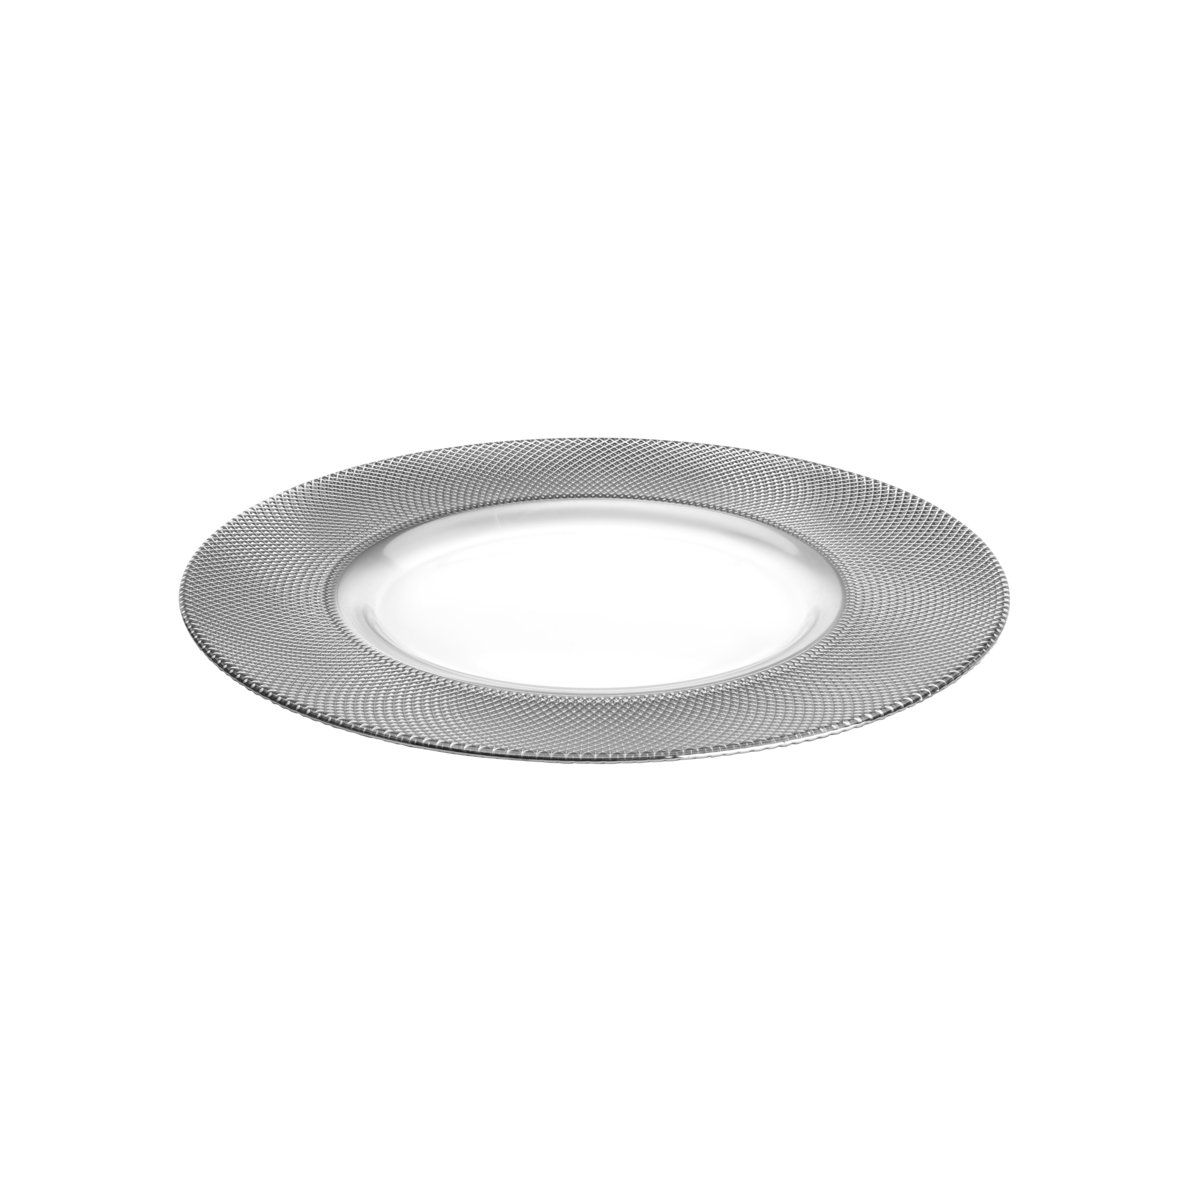 Sousplat 32,5 cm de cristal transparente e prateado Rojemac - 26786